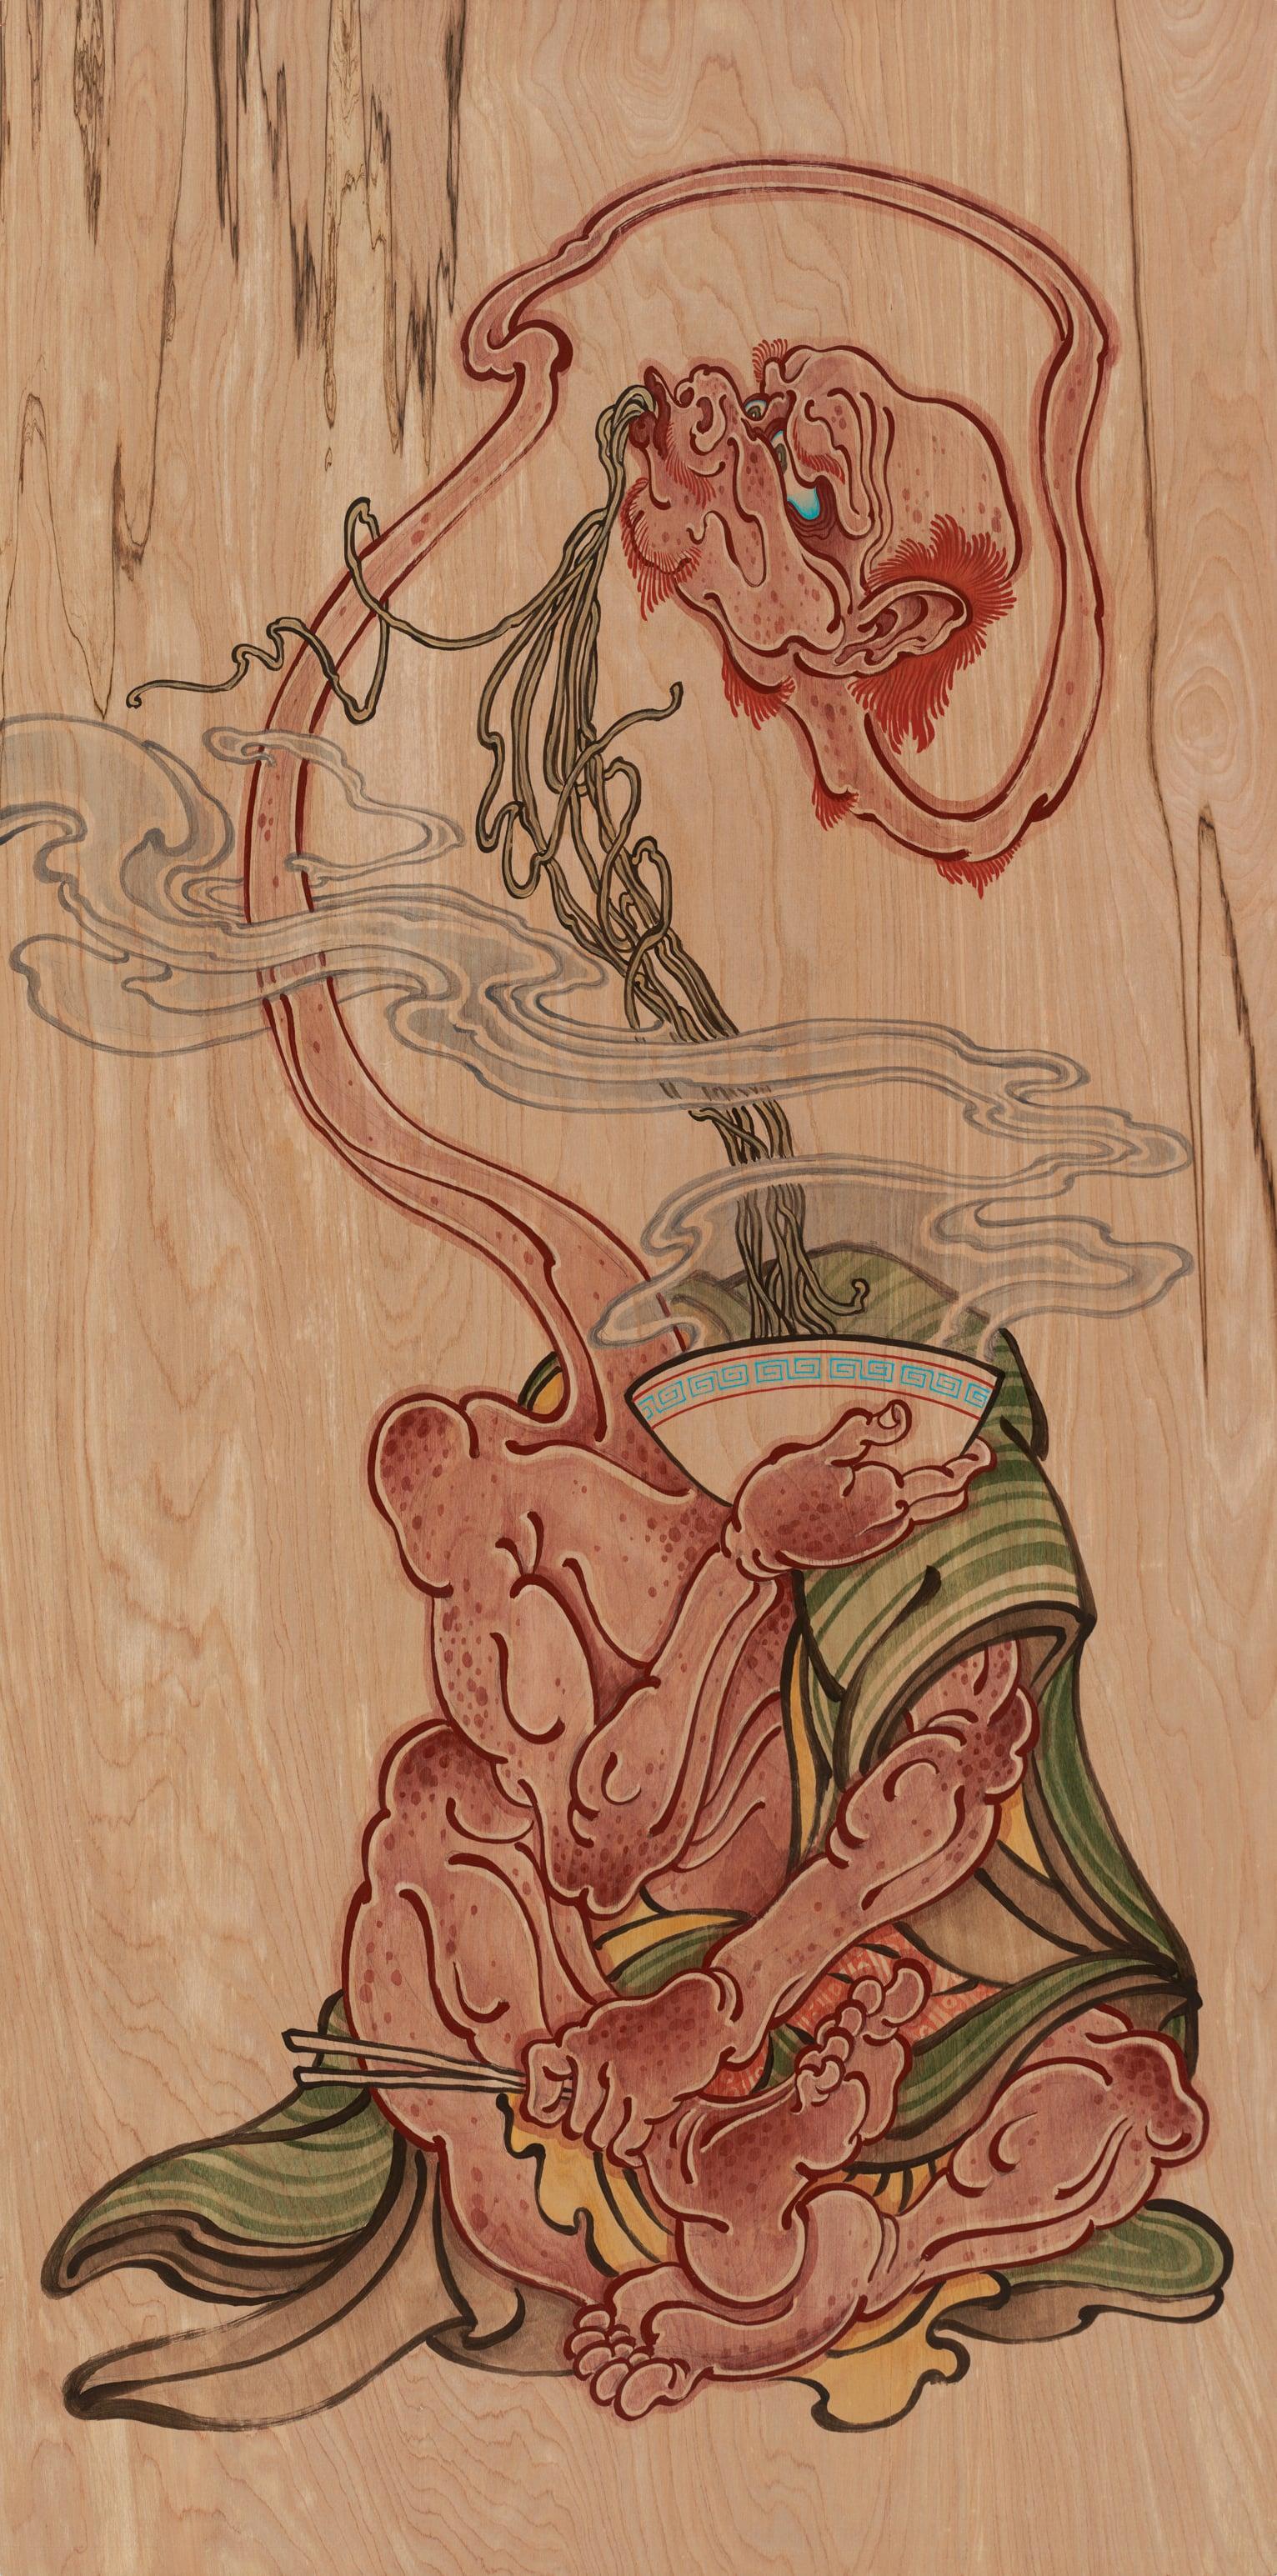 Untitled (rokurokubi with noodles) . 2014 - acrylic on wood. 4' x 2'.